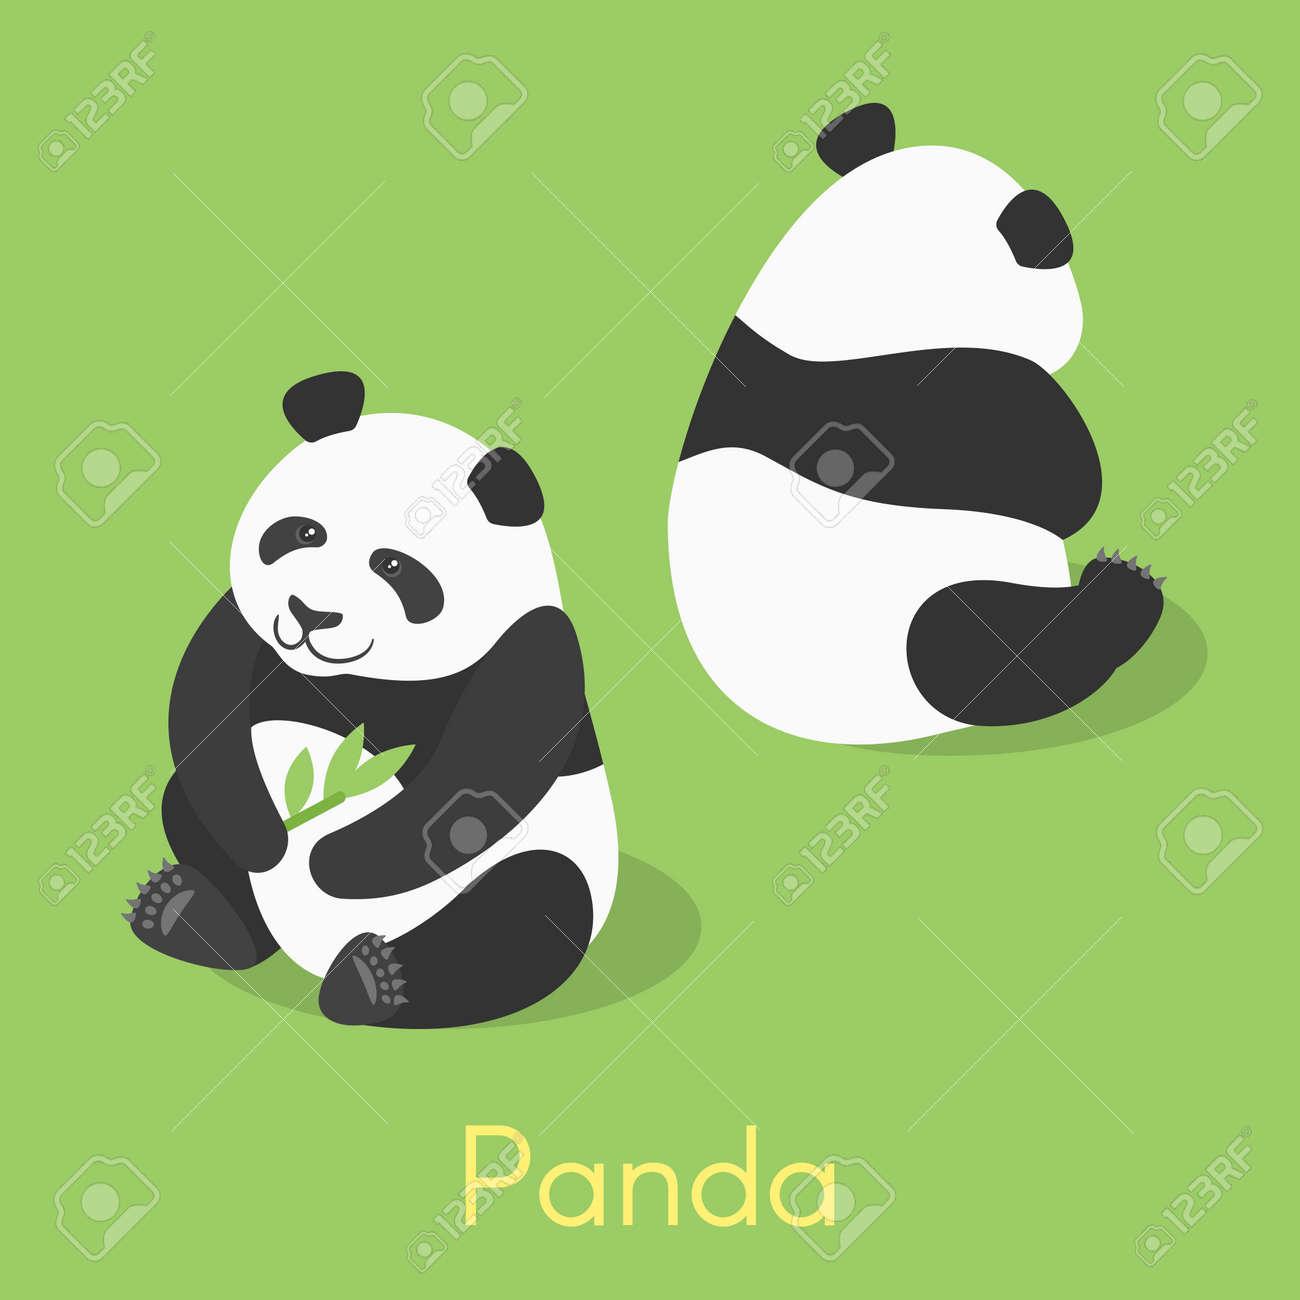 Vector isometric illustration of panda. Panda holding bamboo branch. - 58895928